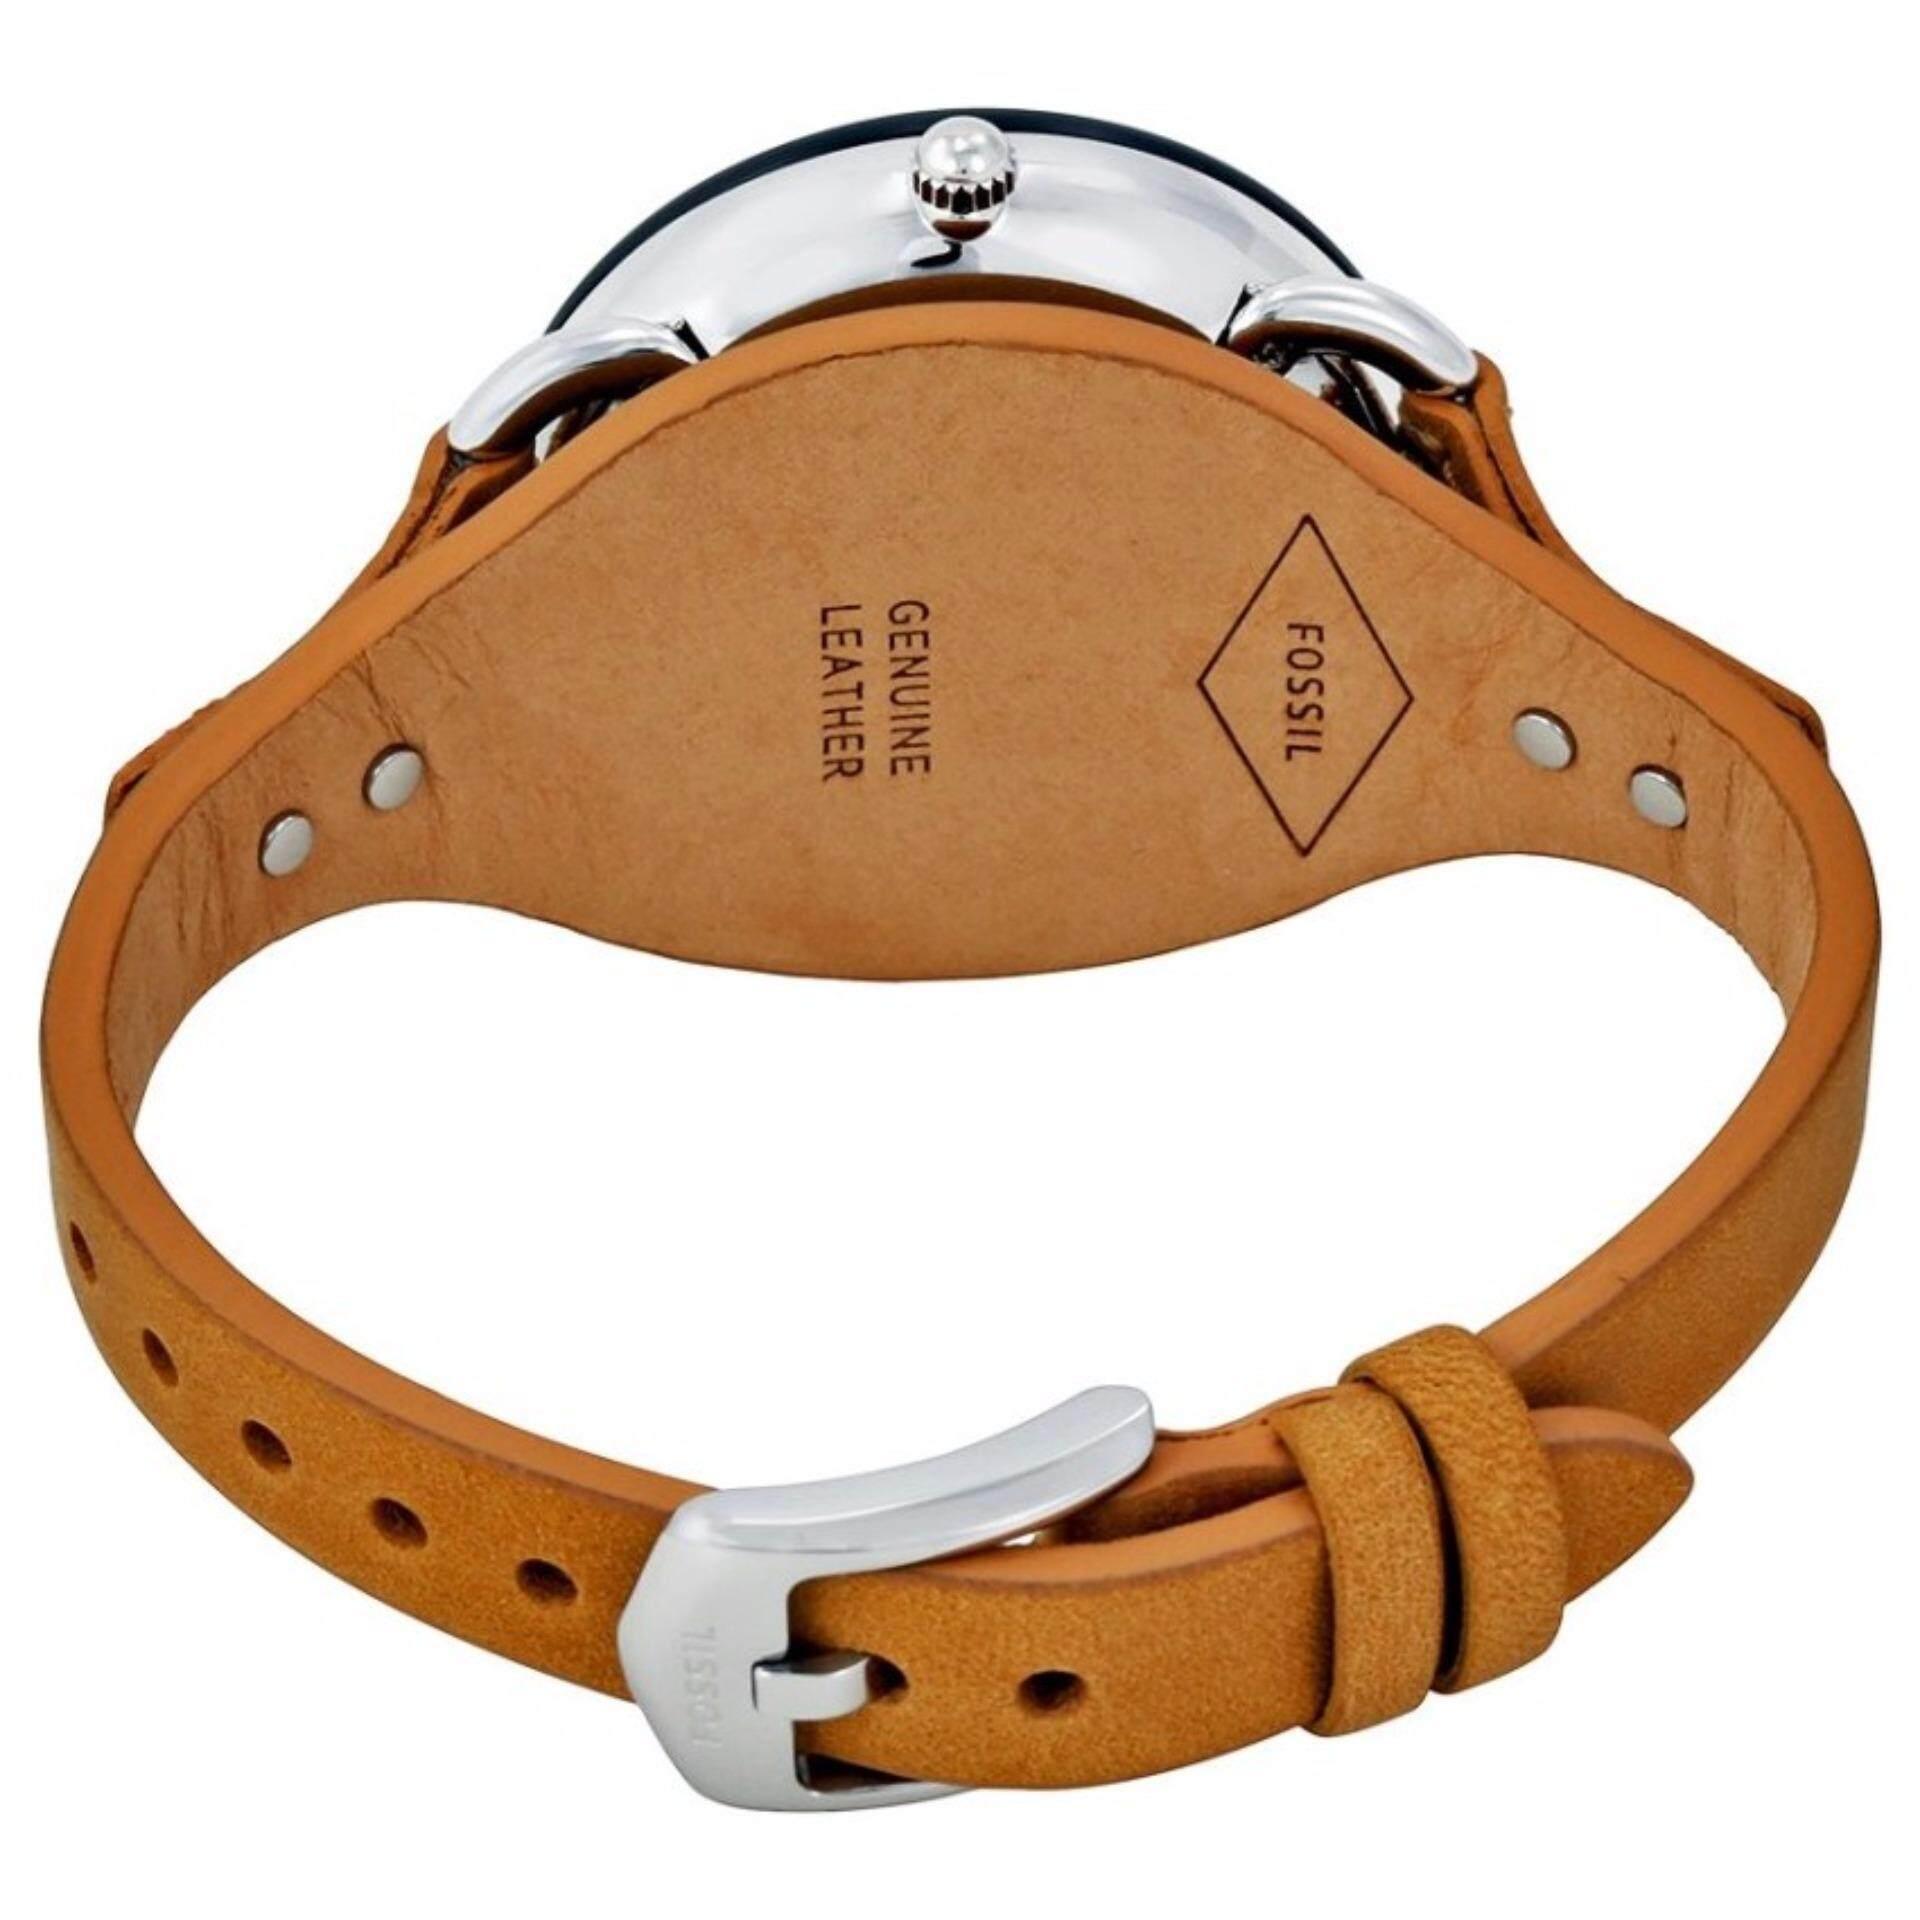 Cek Harga Fossil Es4175 Tailor Multifunction Tan Leather Watch Me3138 Grant Sport Automatic Skeleton Dial Black 3